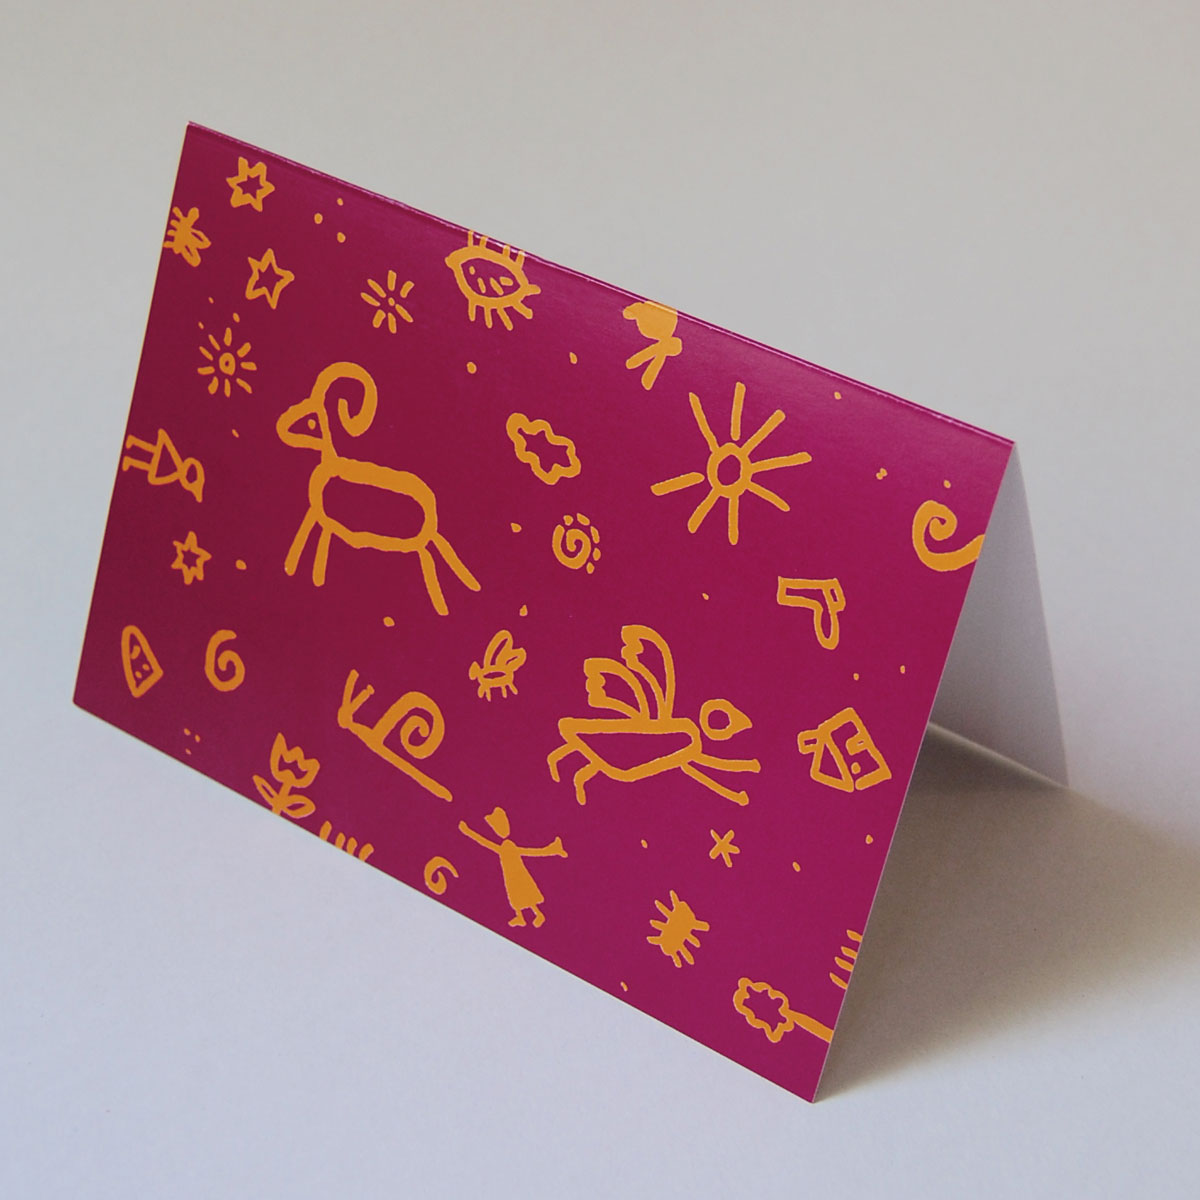 Rote Weihnachtskarten.Weihnachtskarte Weihnachtsviecher